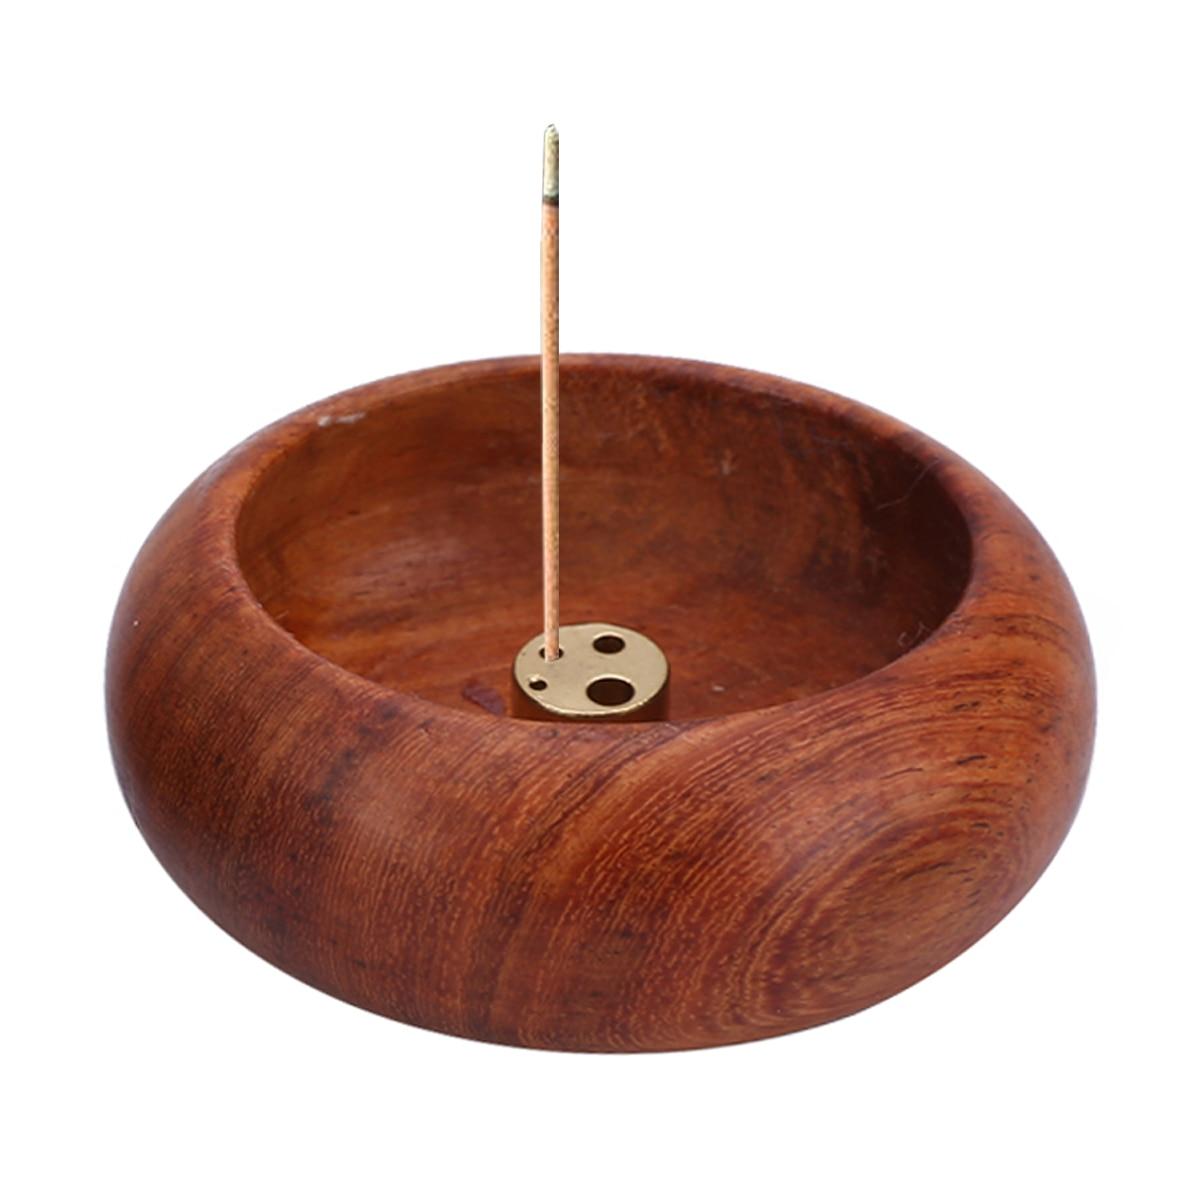 1pc New Rosewood Incense Burner Stick Holder Bowl Shape Censer Home Decoration Smell Aromatic Smell Aromatic